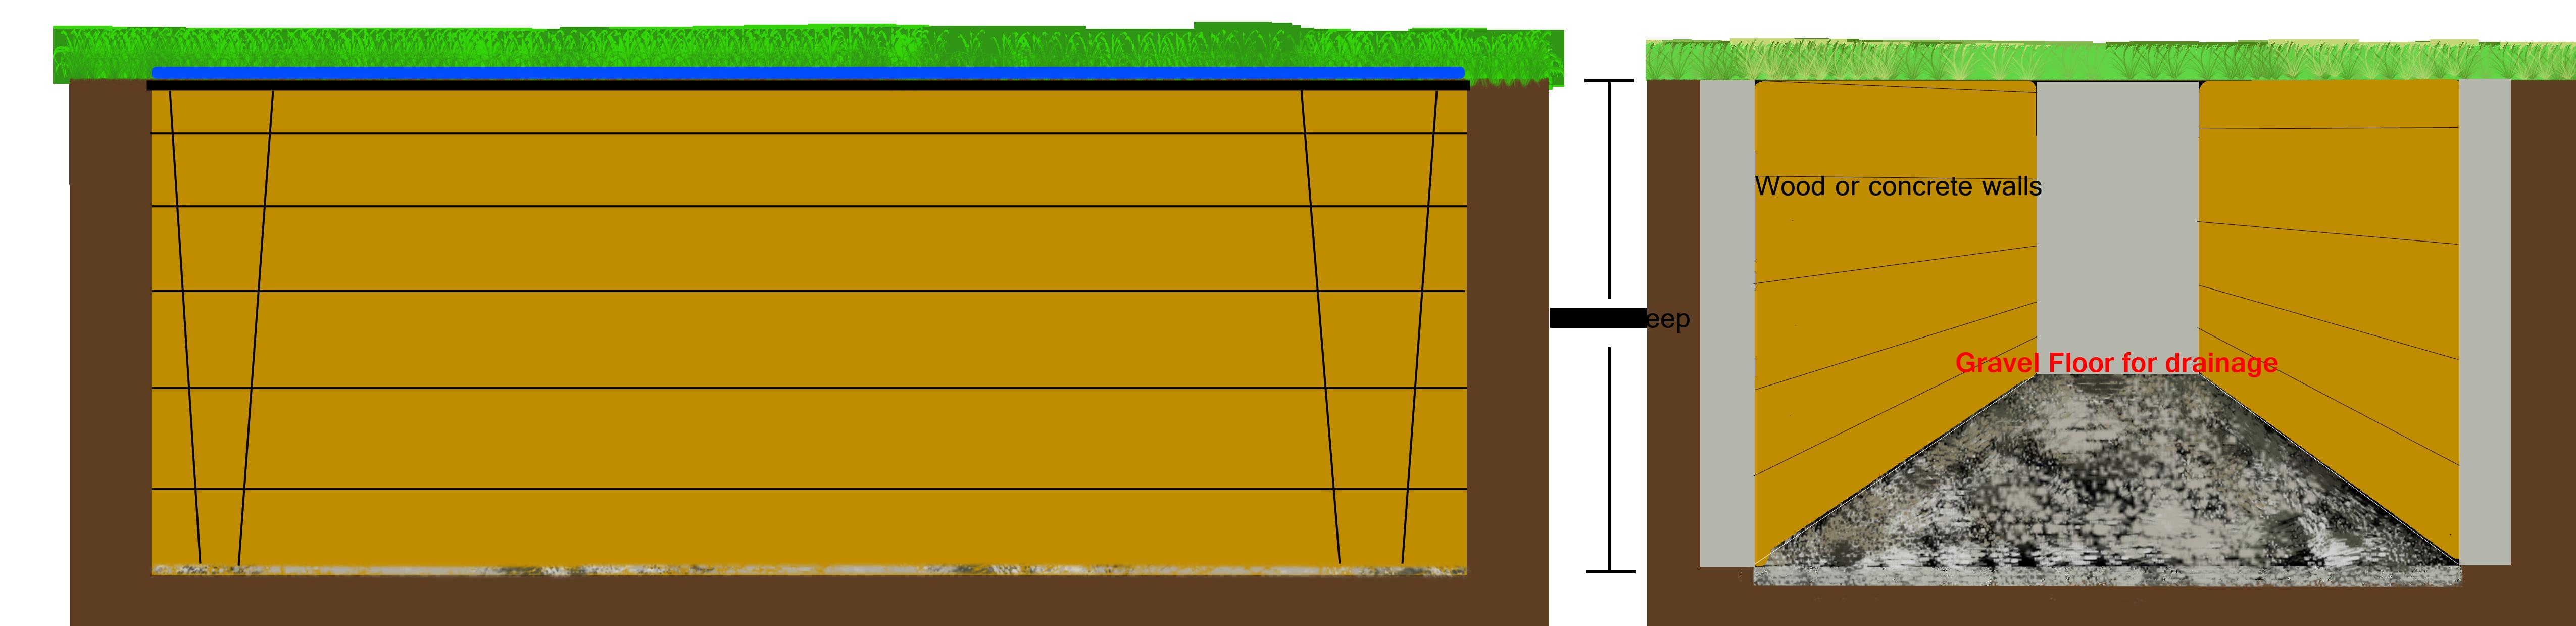 elite-pit-diagram.png